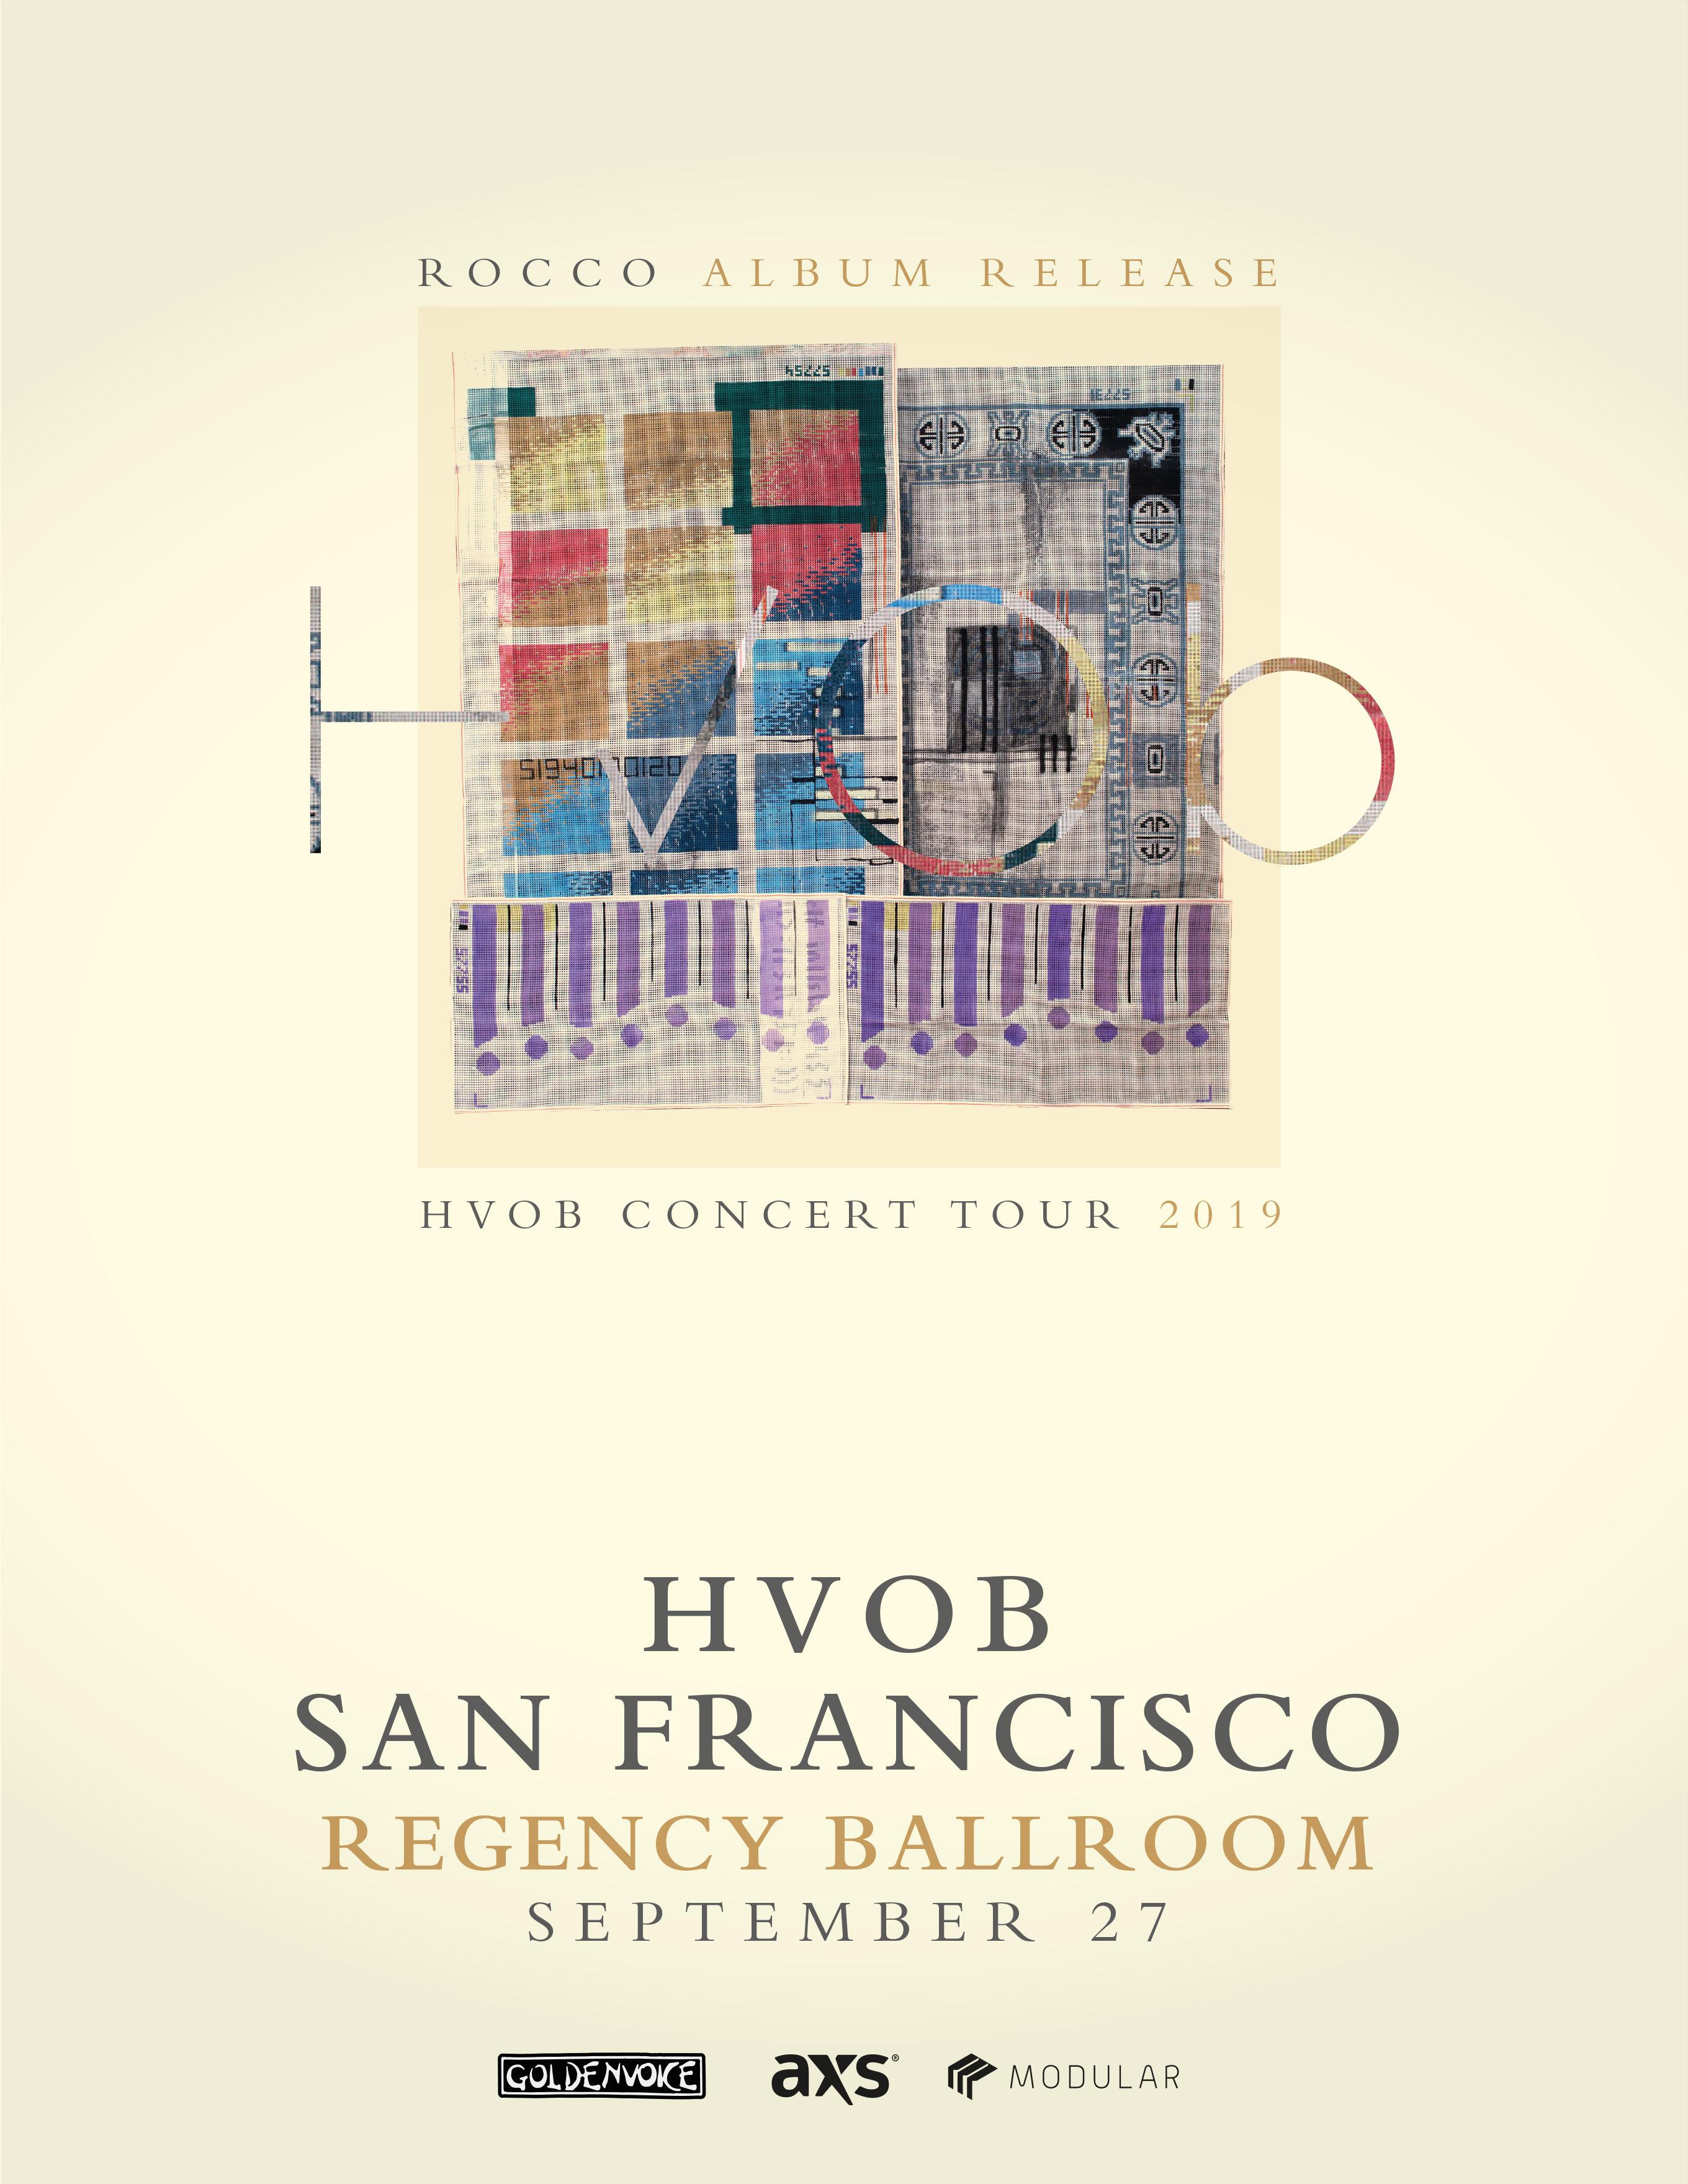 HVoB San Francisco